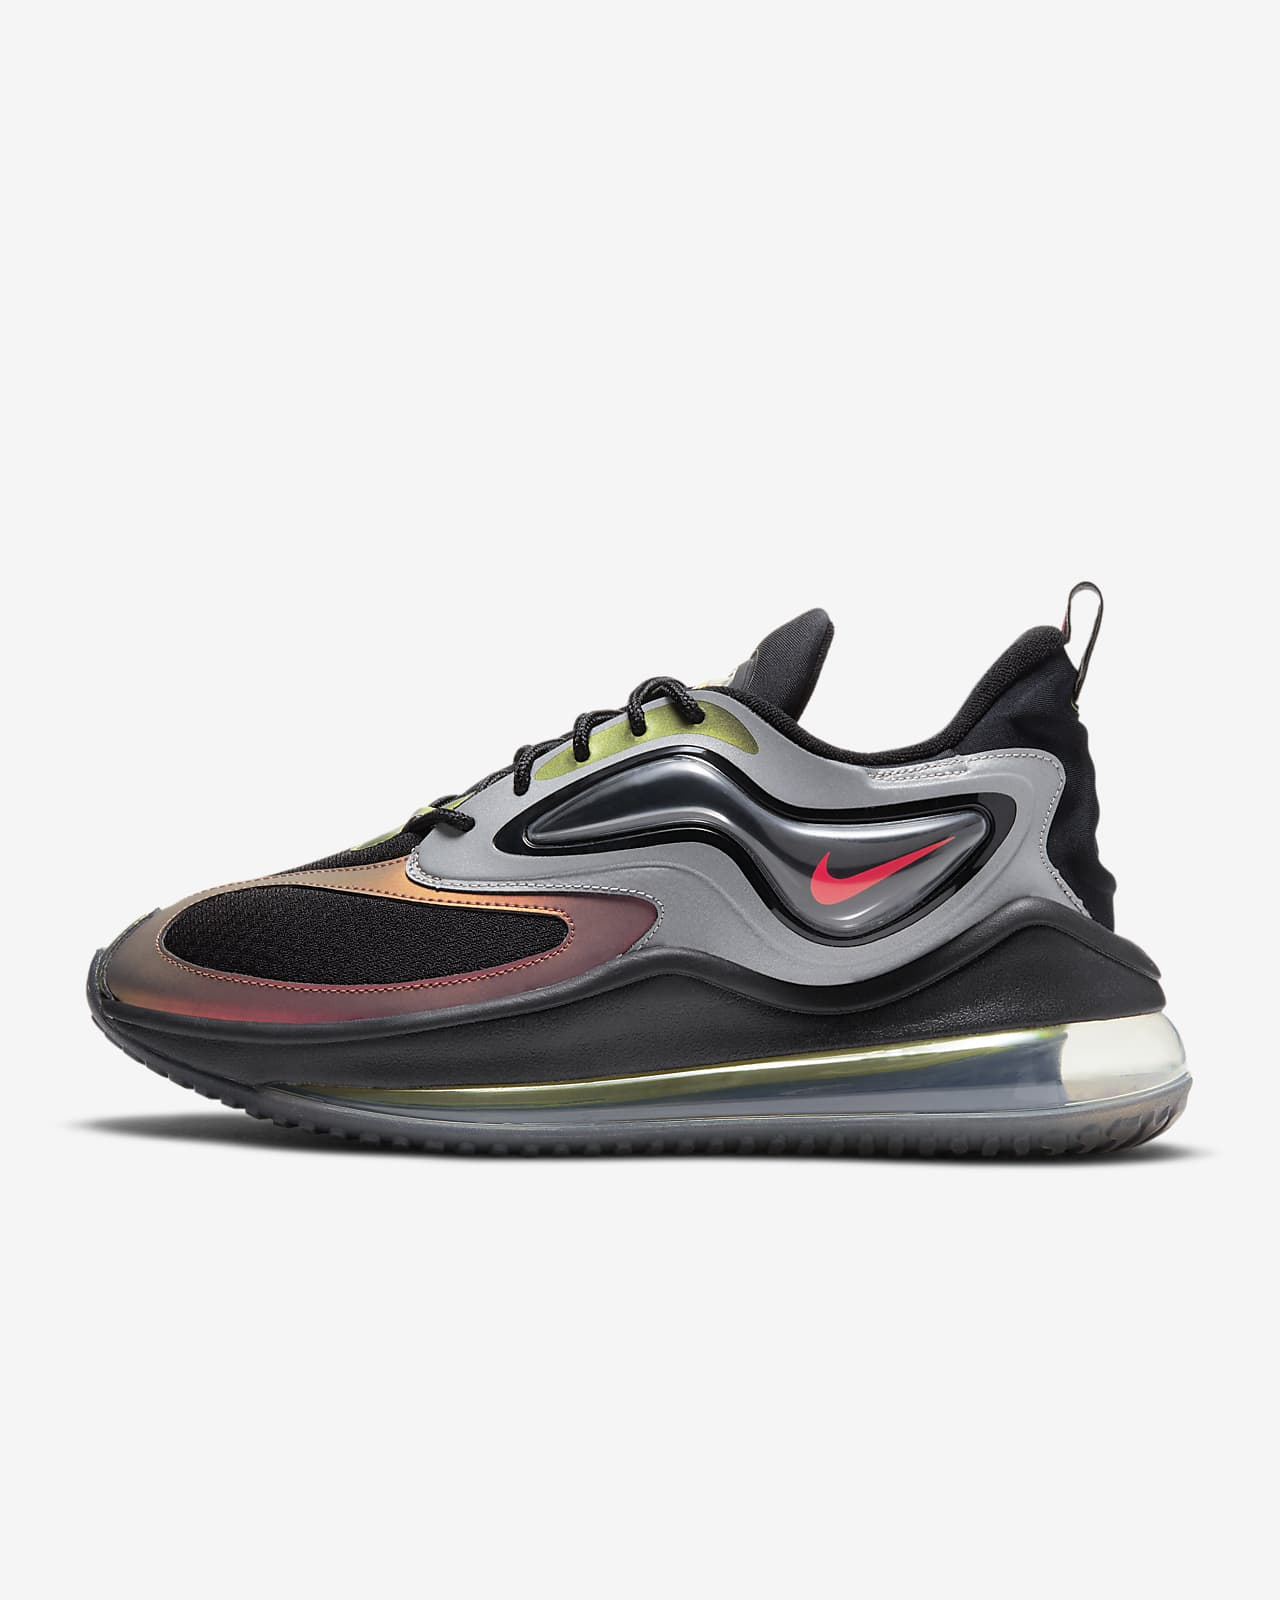 Nike Air Max Zephyr EOI 男子运动鞋